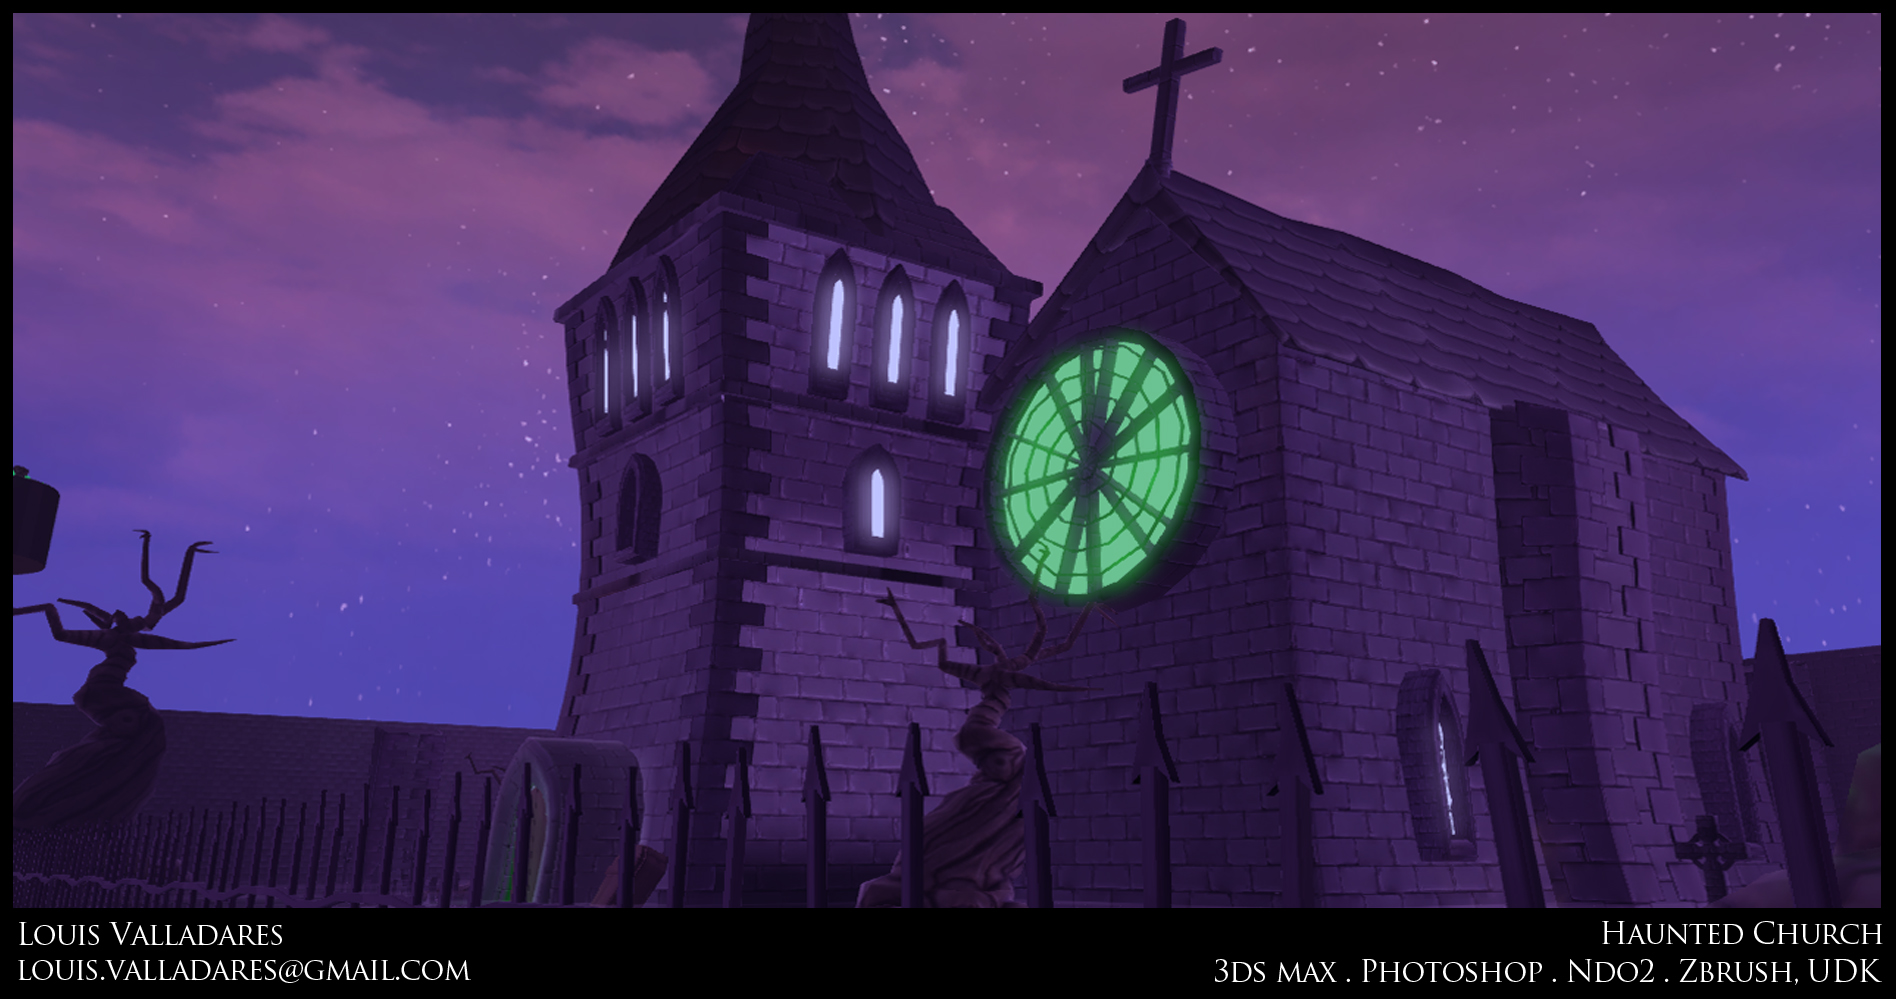 » Haunted Church